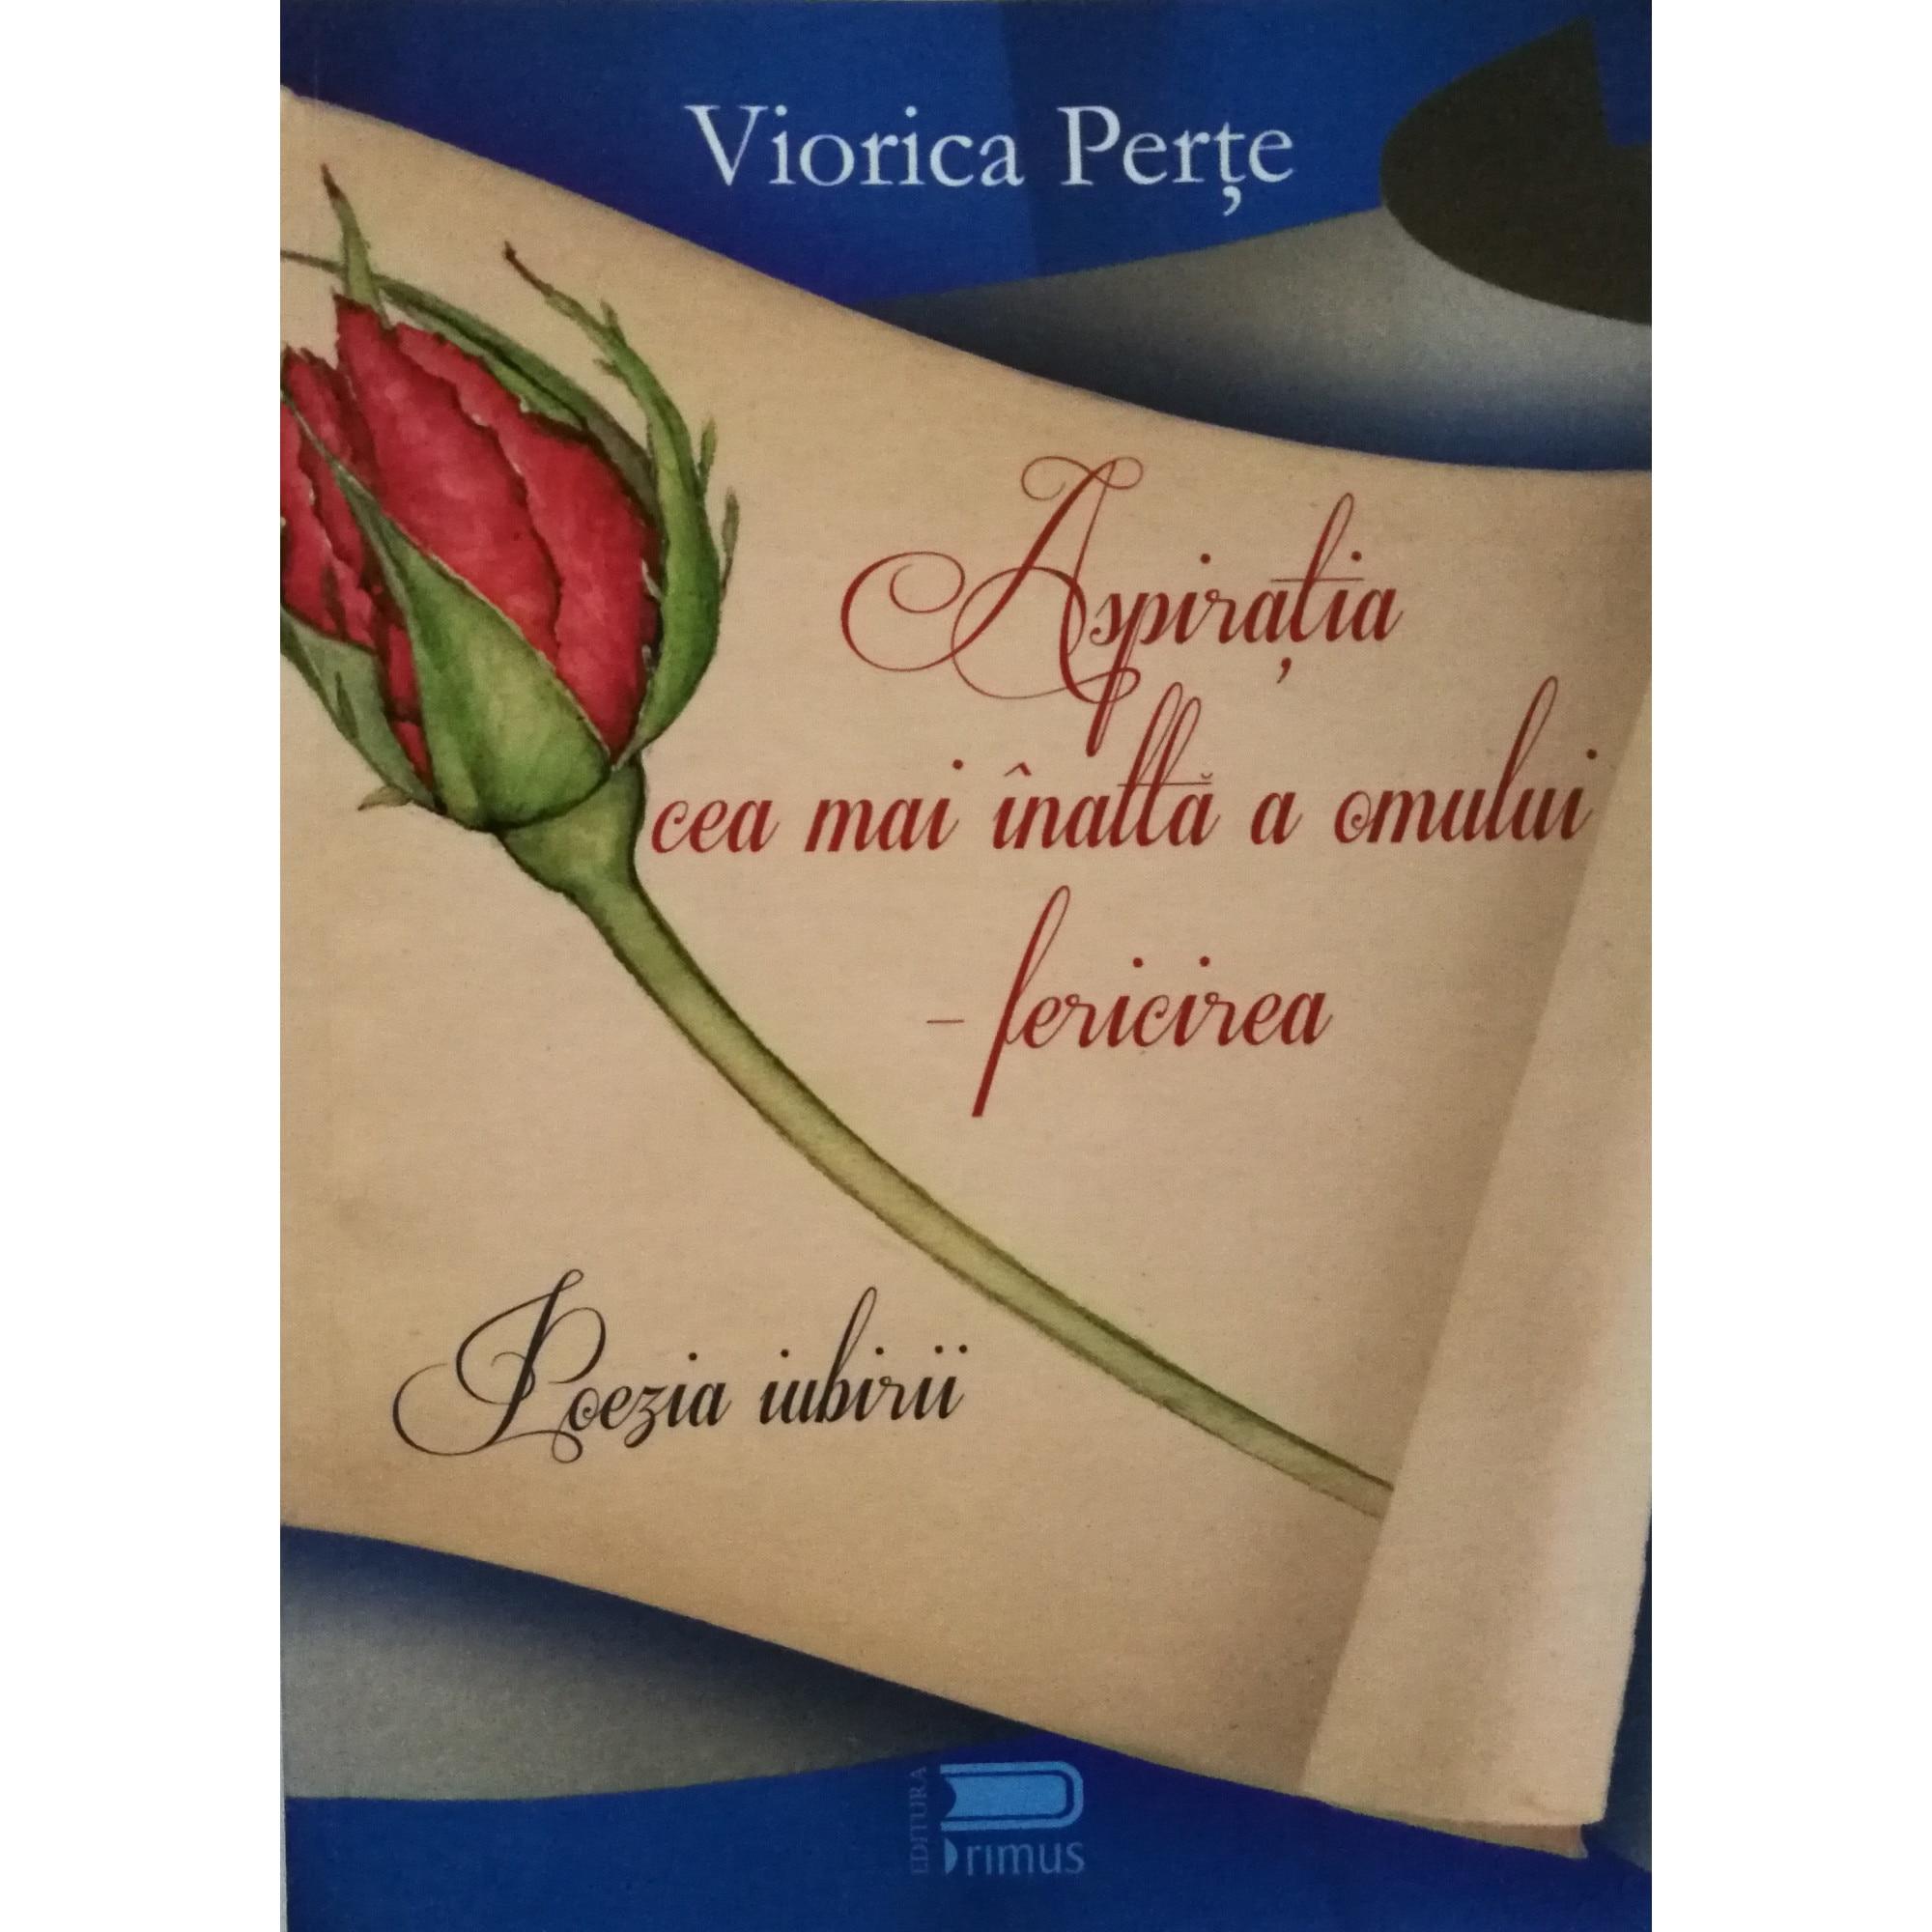 cauta i poemul iubirii pentru o femeie)